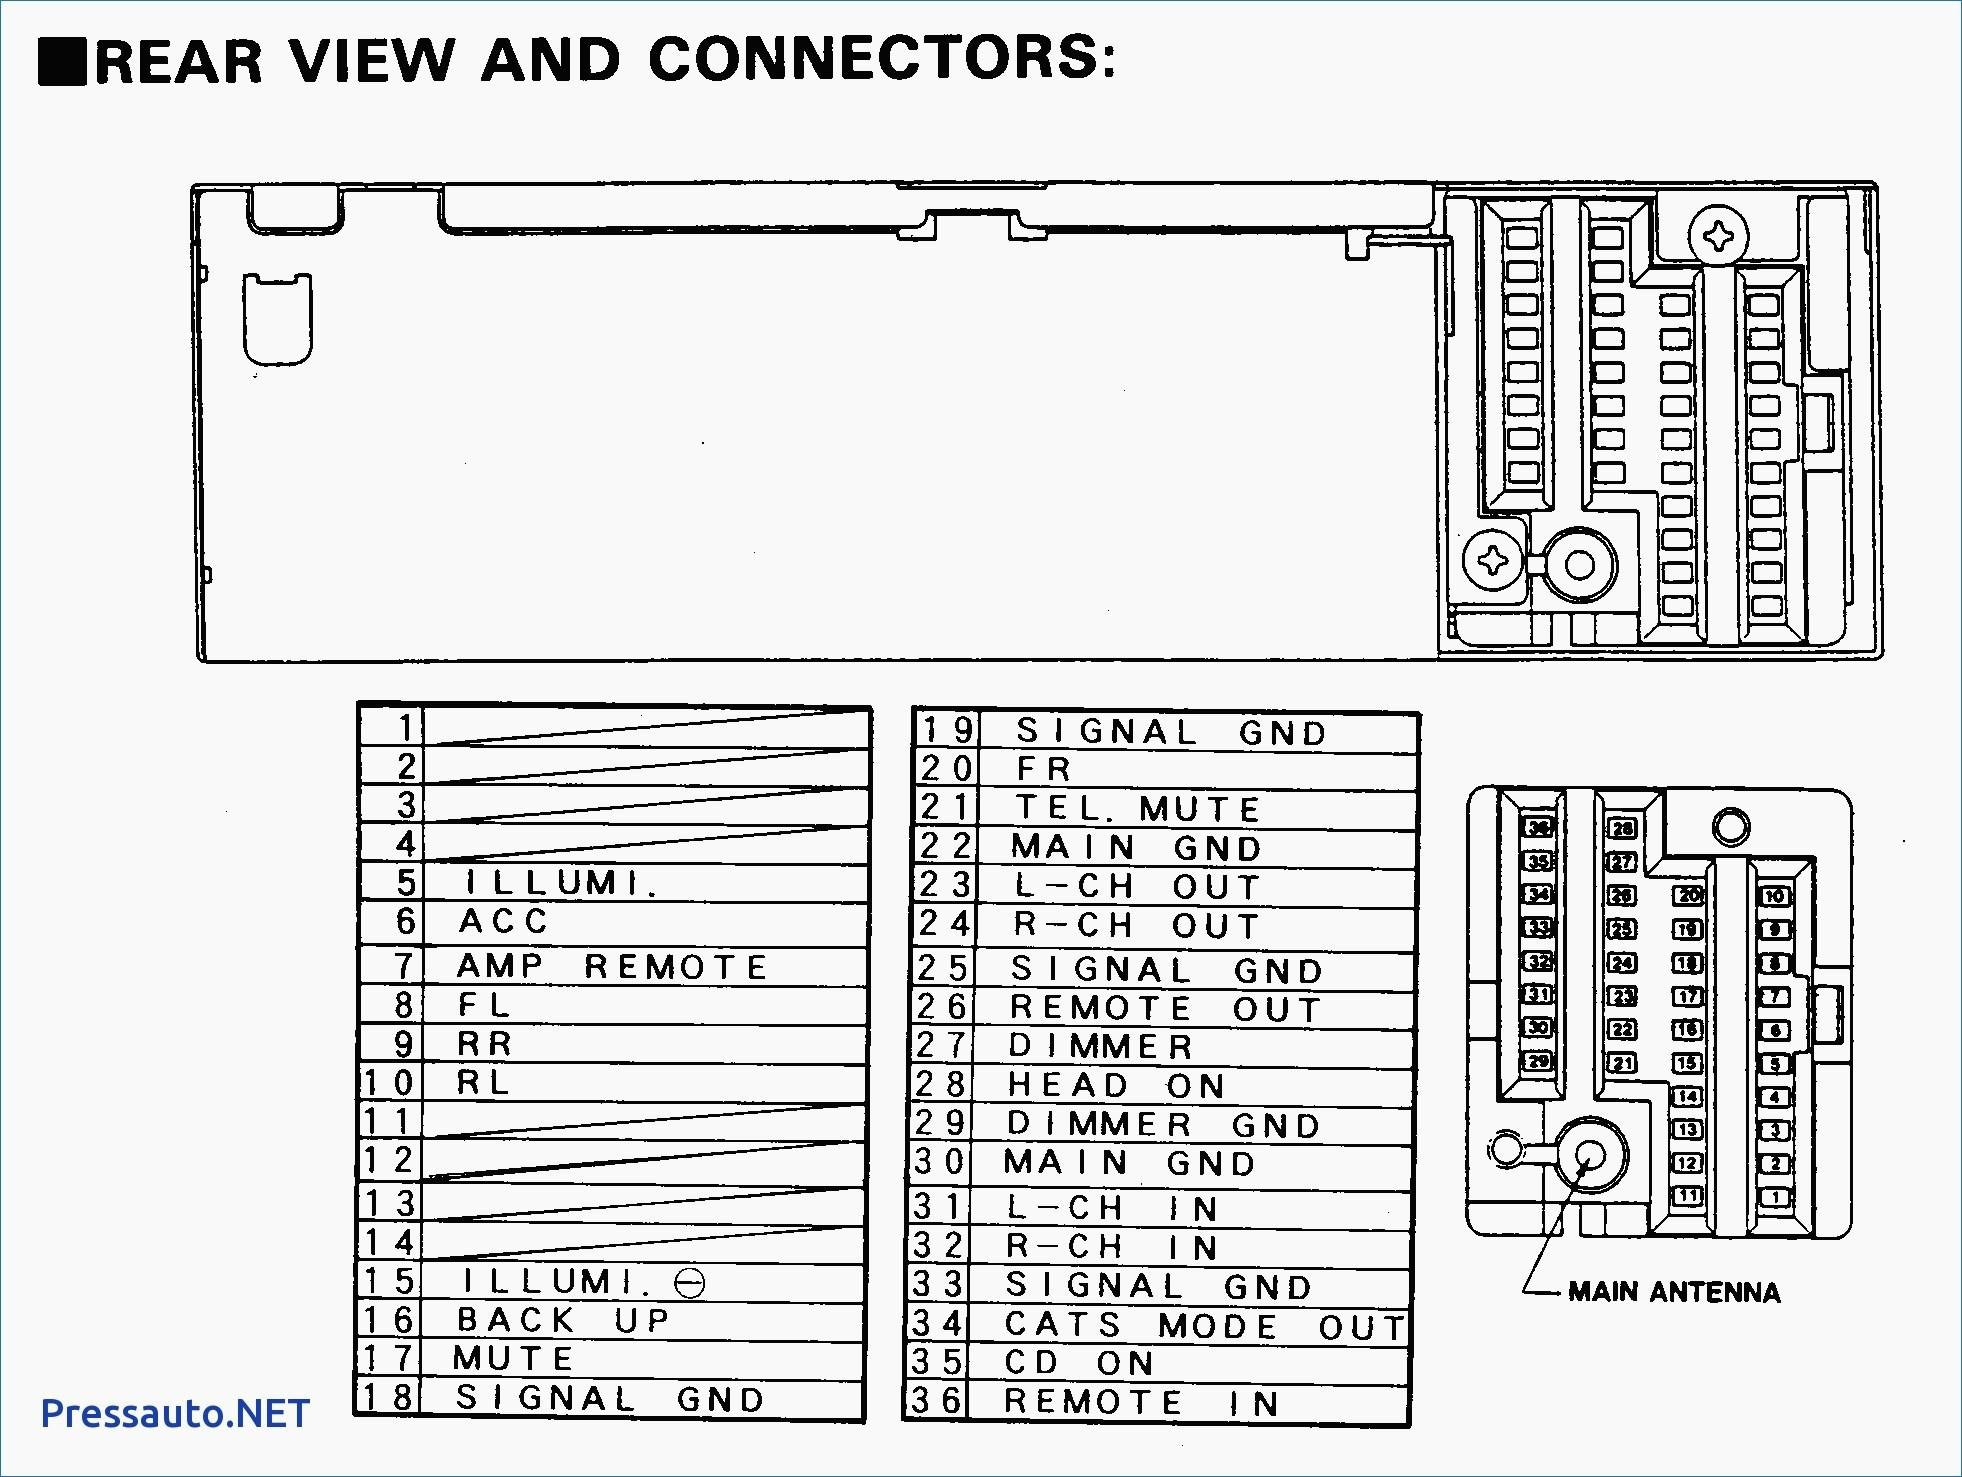 hight resolution of car sound wiring diagram wiring diagram for amplifier car stereo new amplifier wiring diagram inspirational